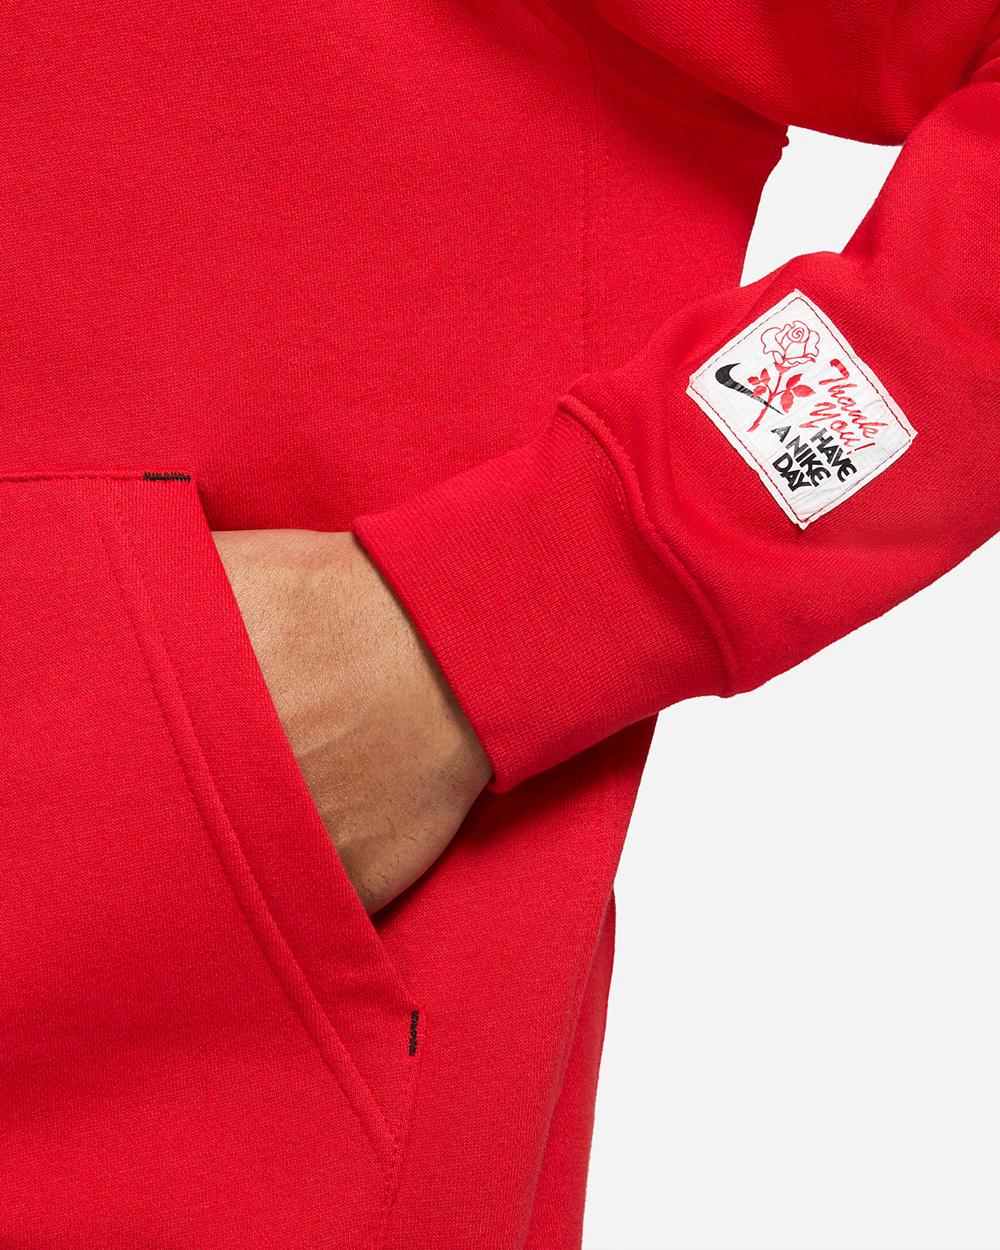 nike-bodega-red-hoodie-3